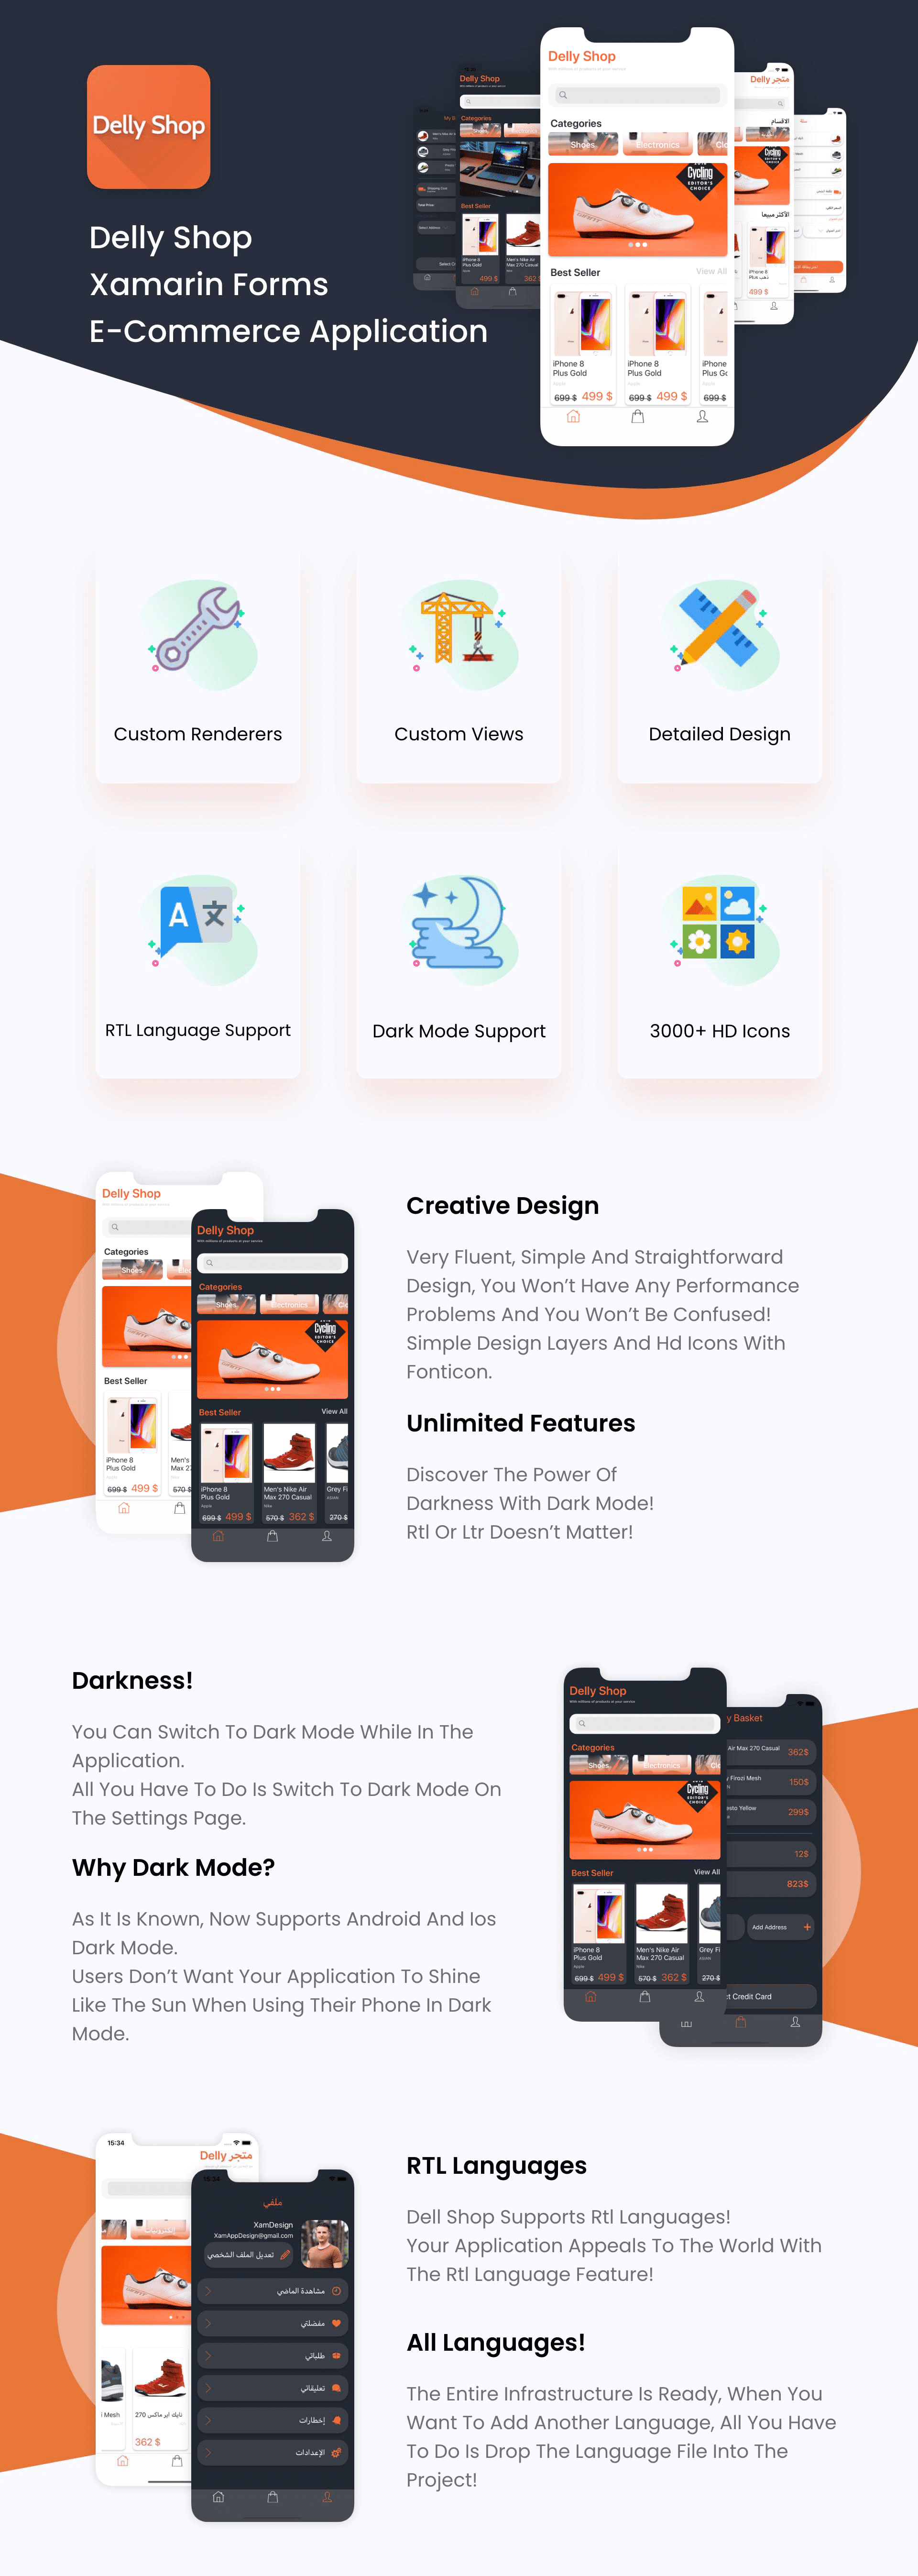 DellyShop E-Commerce App   Xamarin Forms - 9